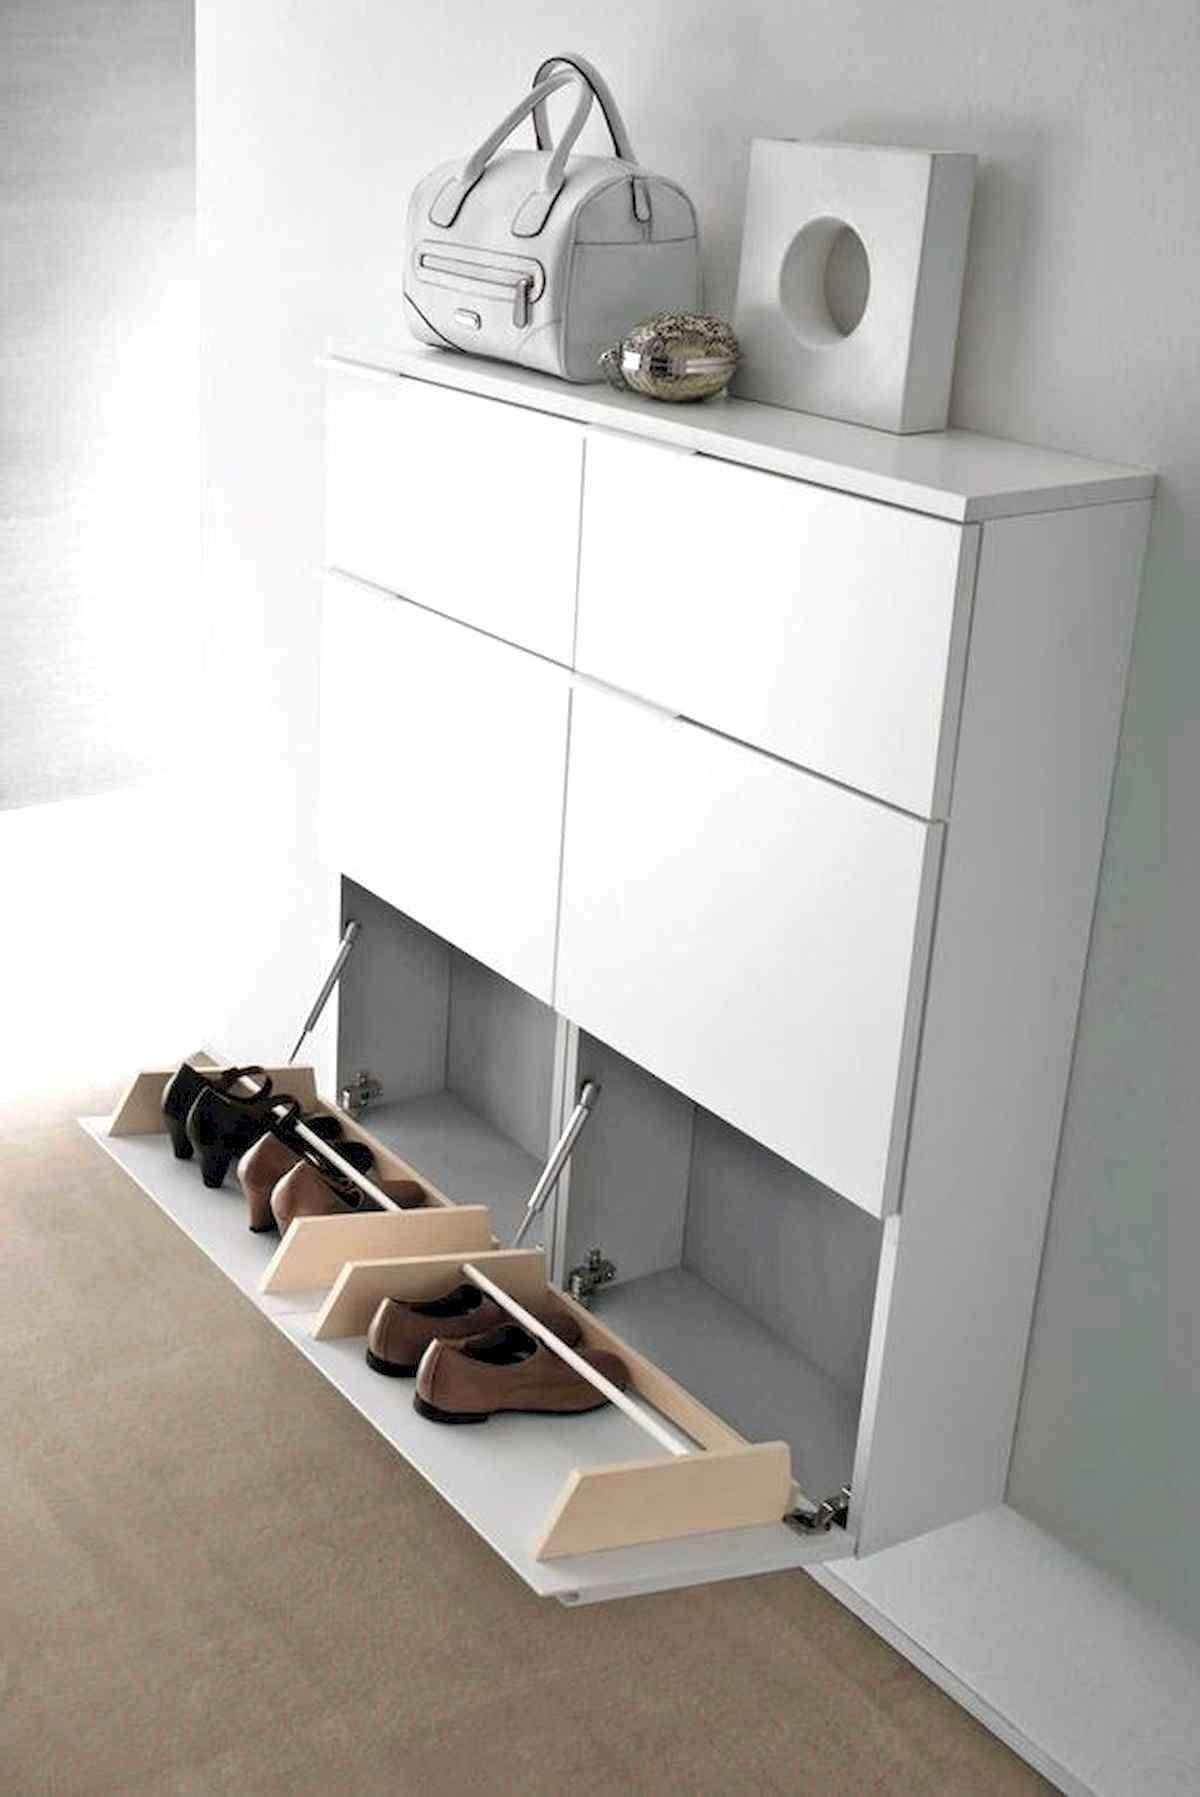 50 Super Cool Shoes Rack Design Ideas Wall Shoe Rack Diy Shoe Rack Rack Design